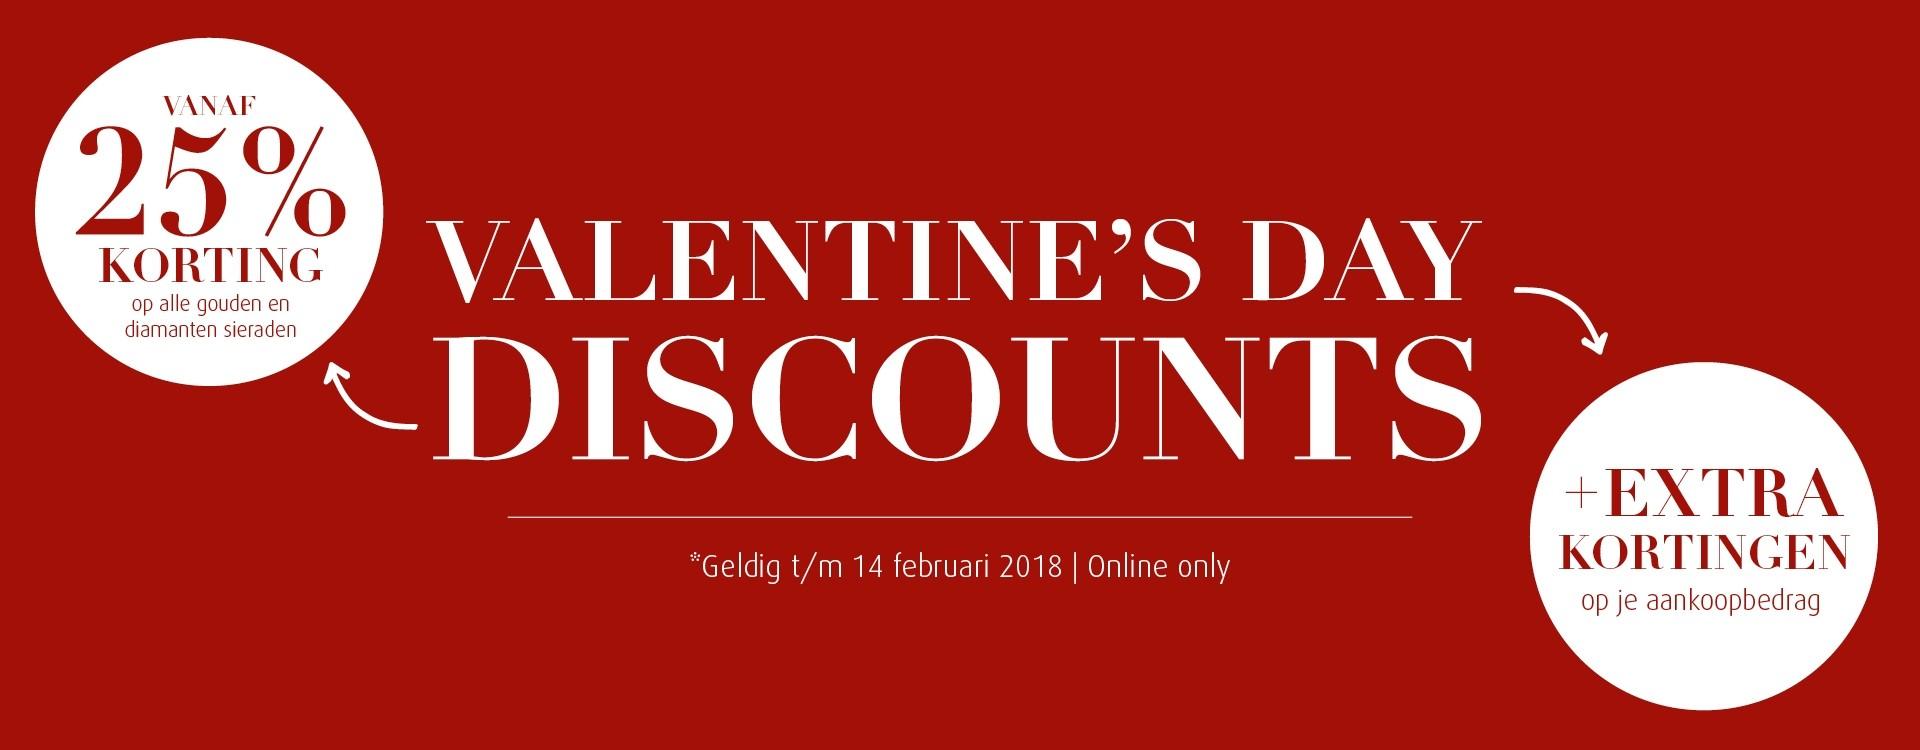 Valentine discounts